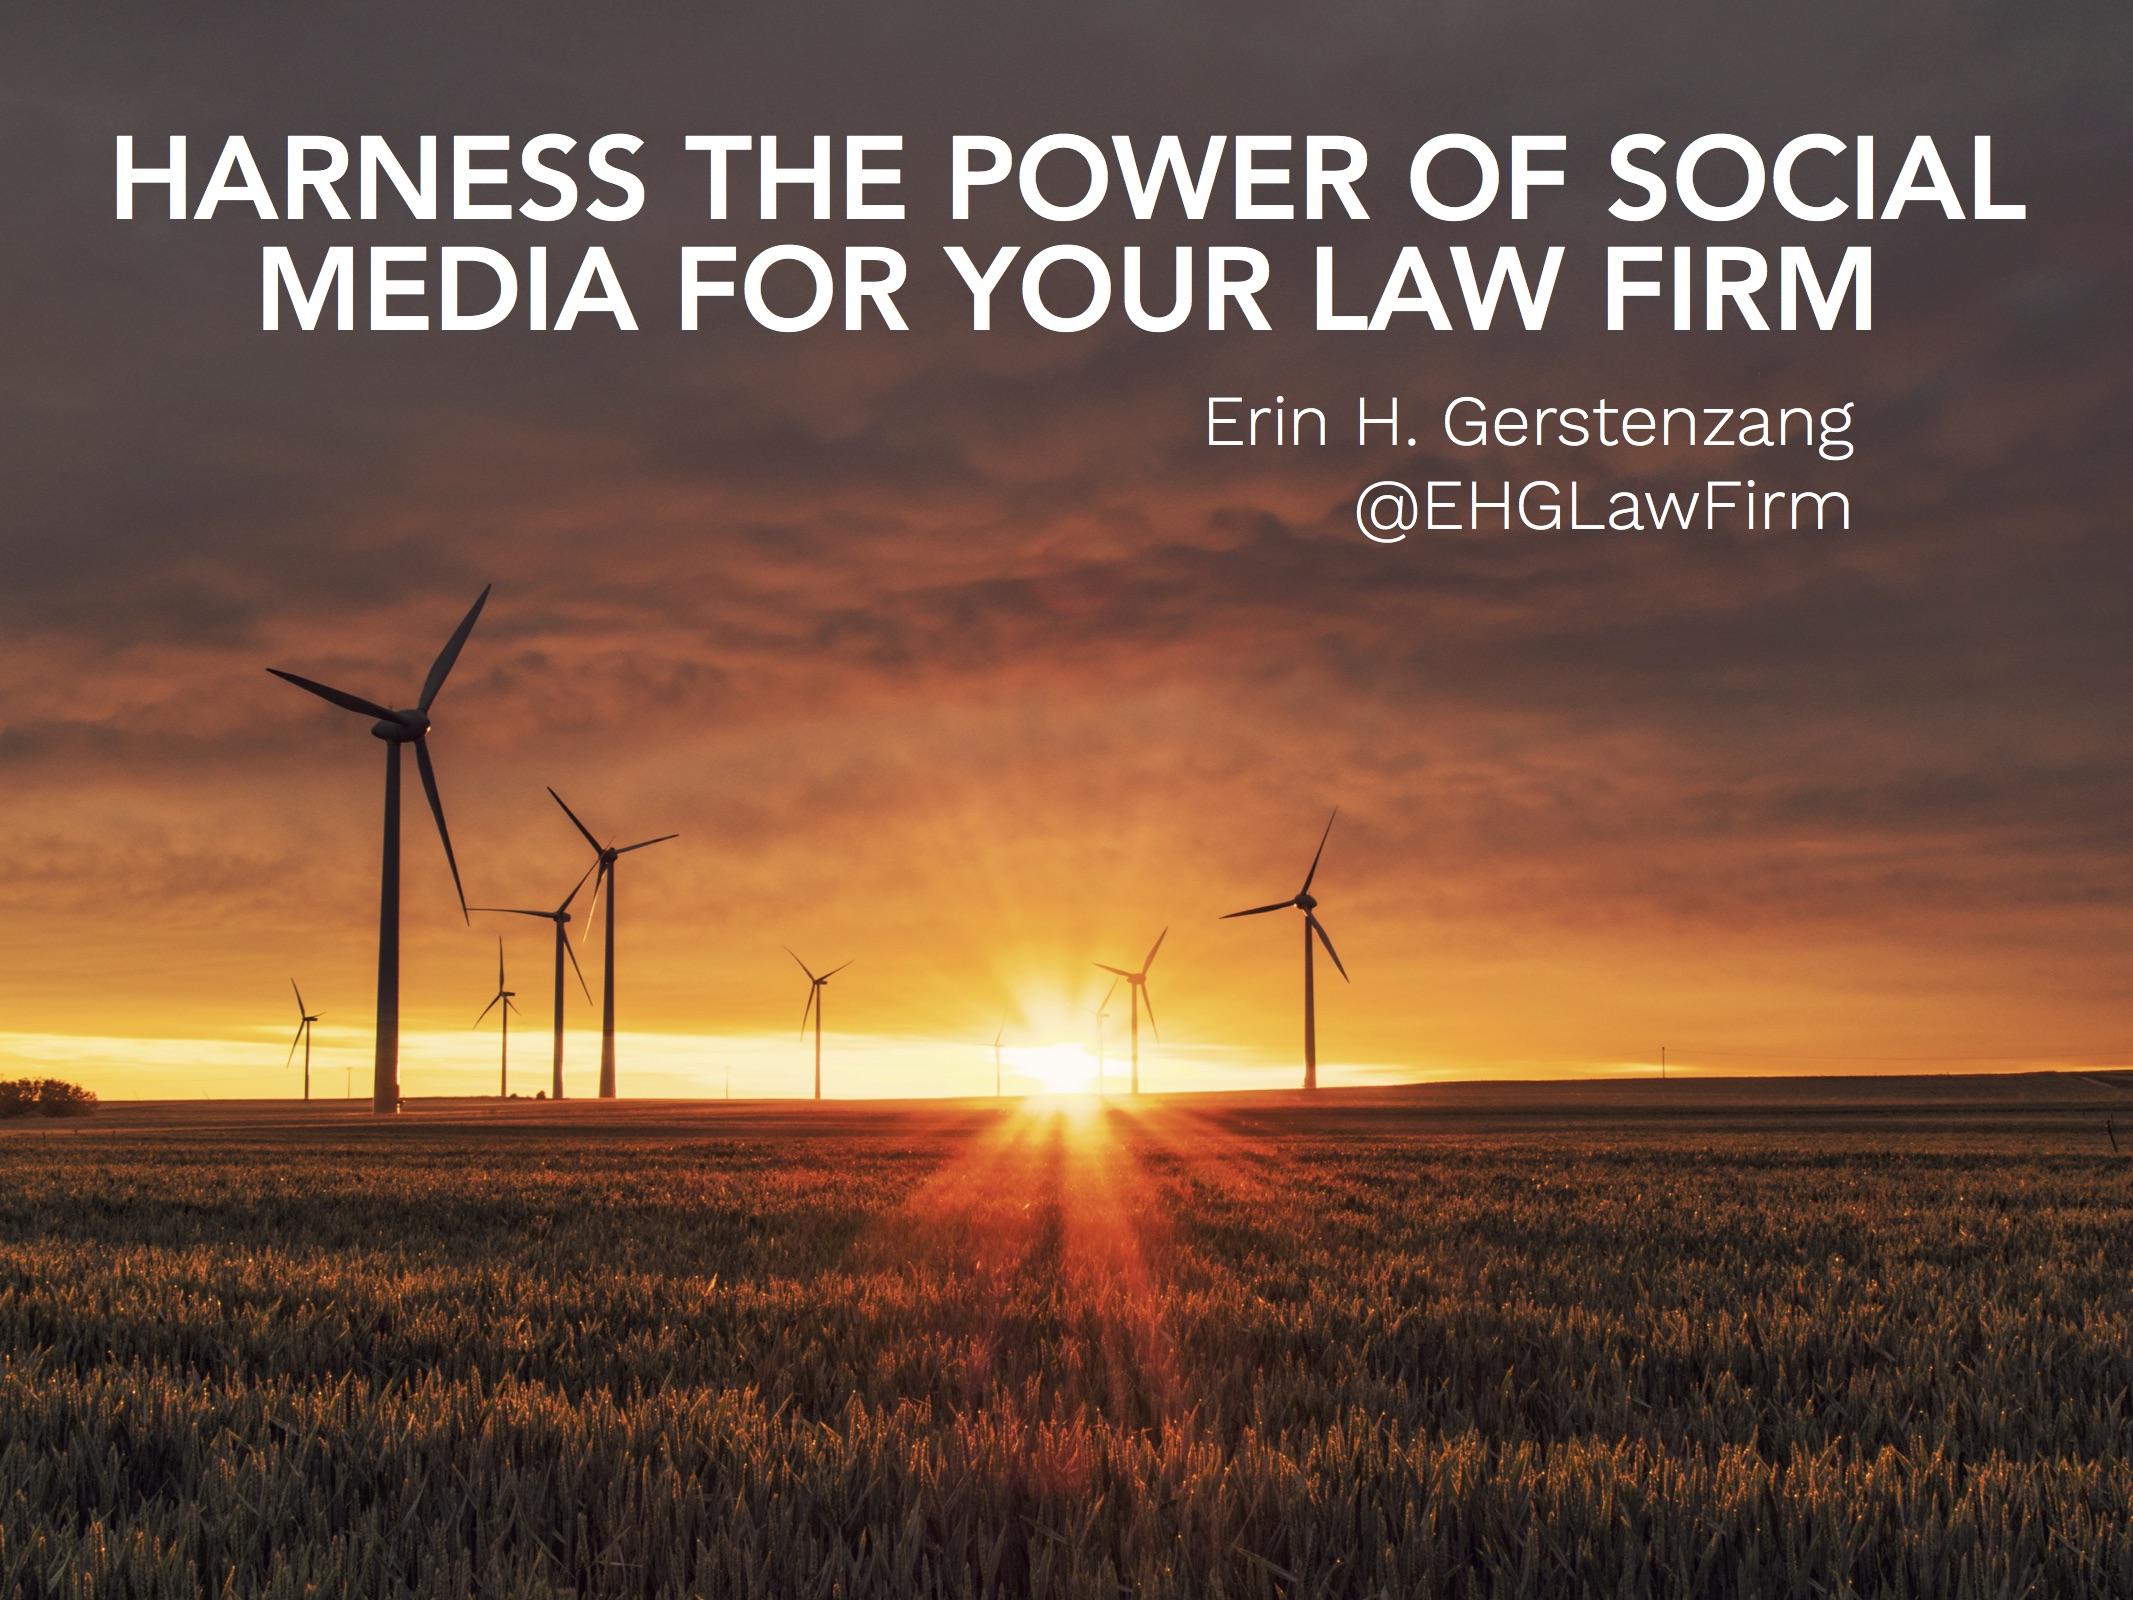 Harness Social Media Cover.jpg